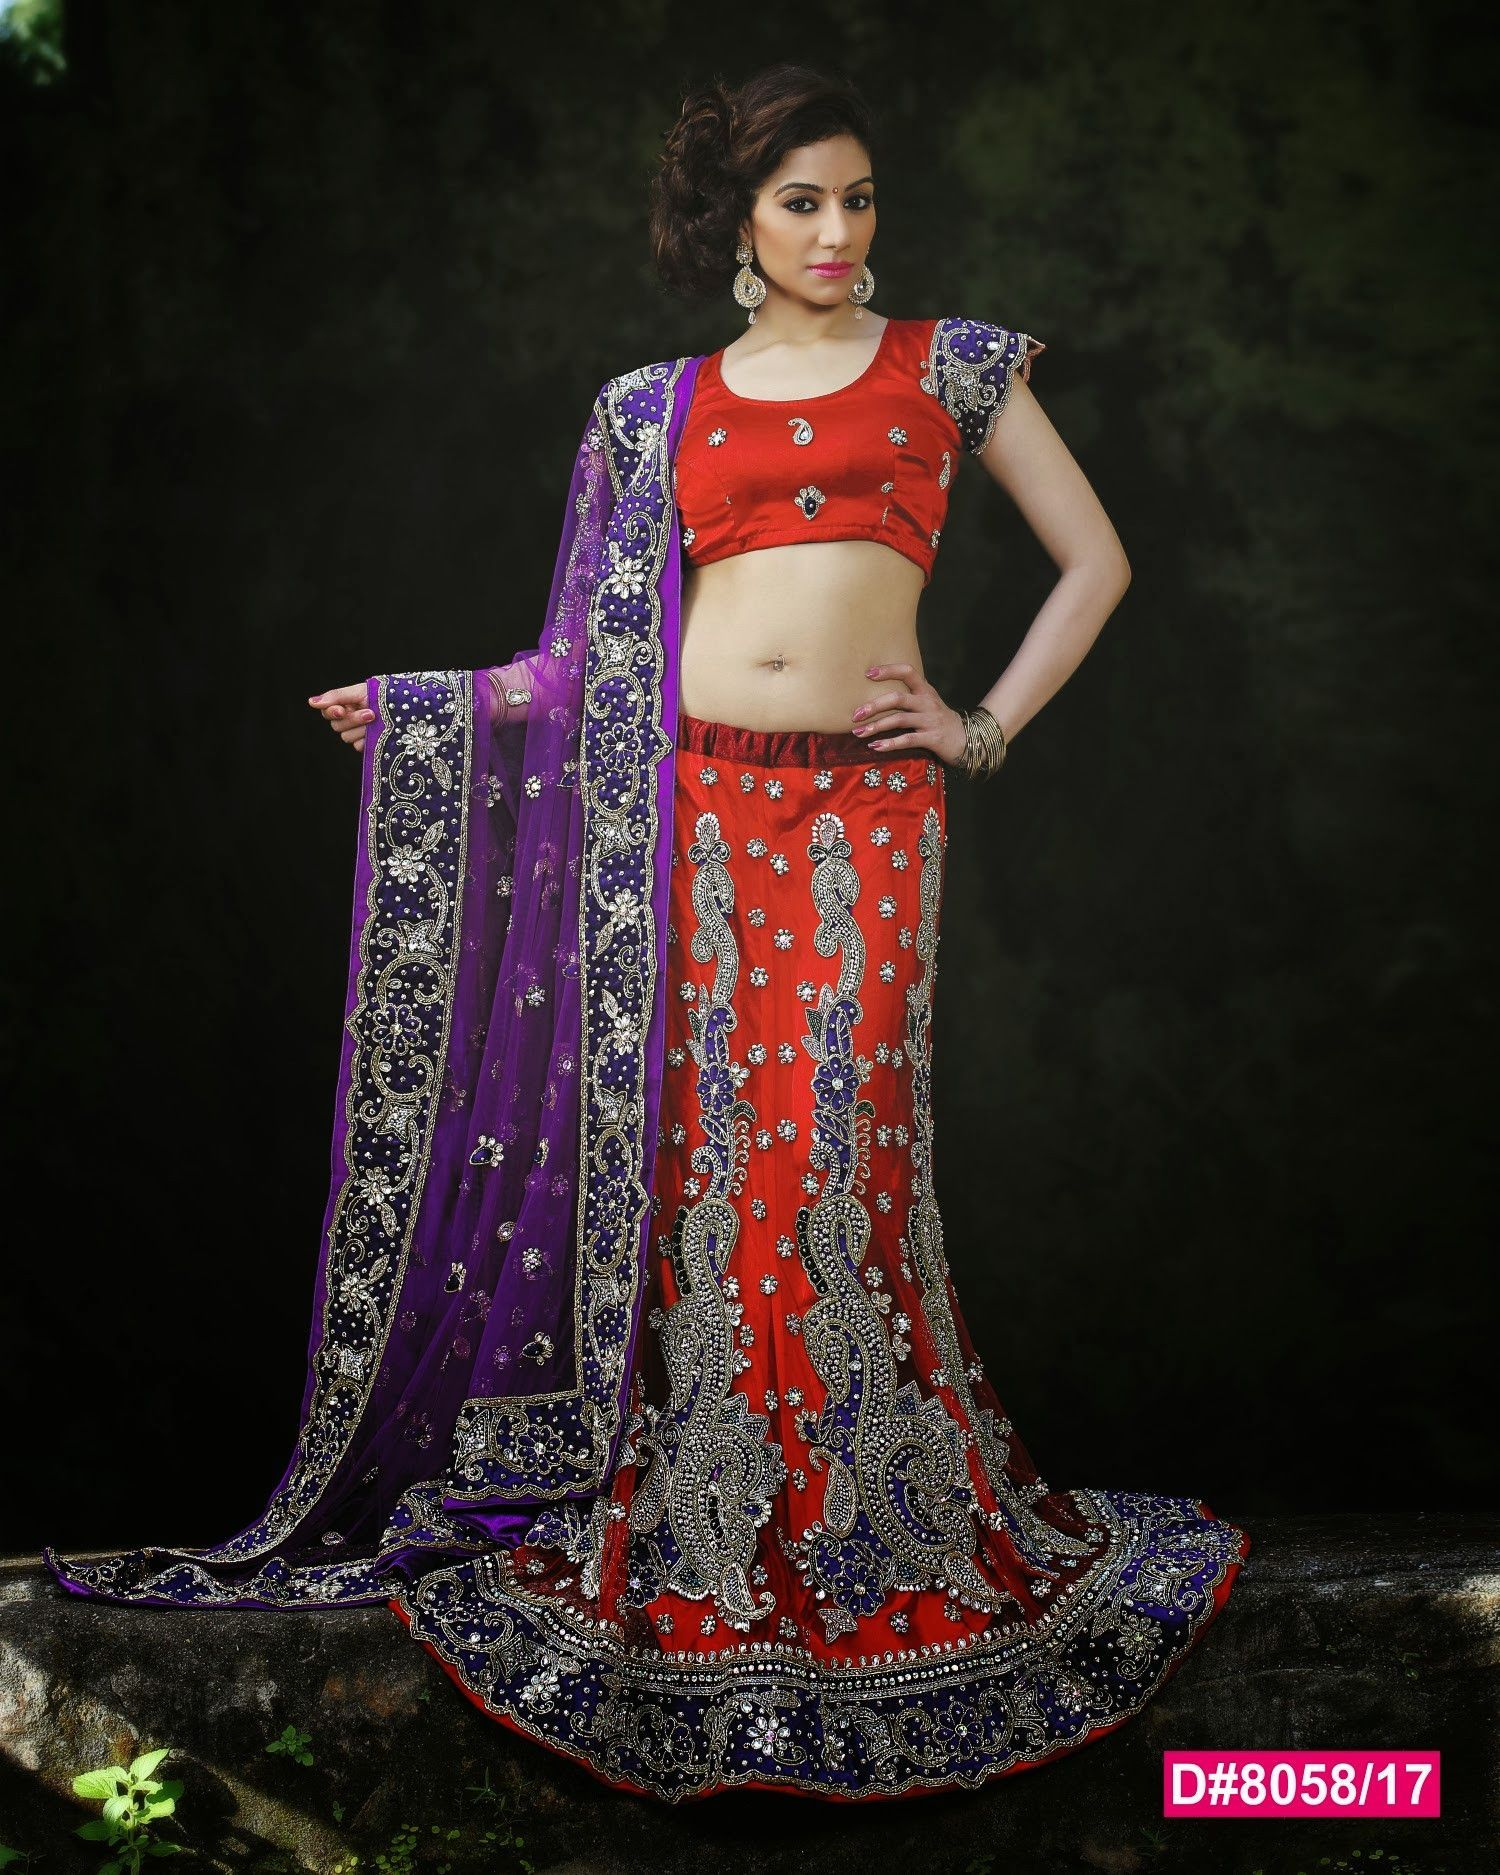 e9f5b0b233 Red & Purple Indian Bridal Lehenga in 2019 | Women's fashion ...